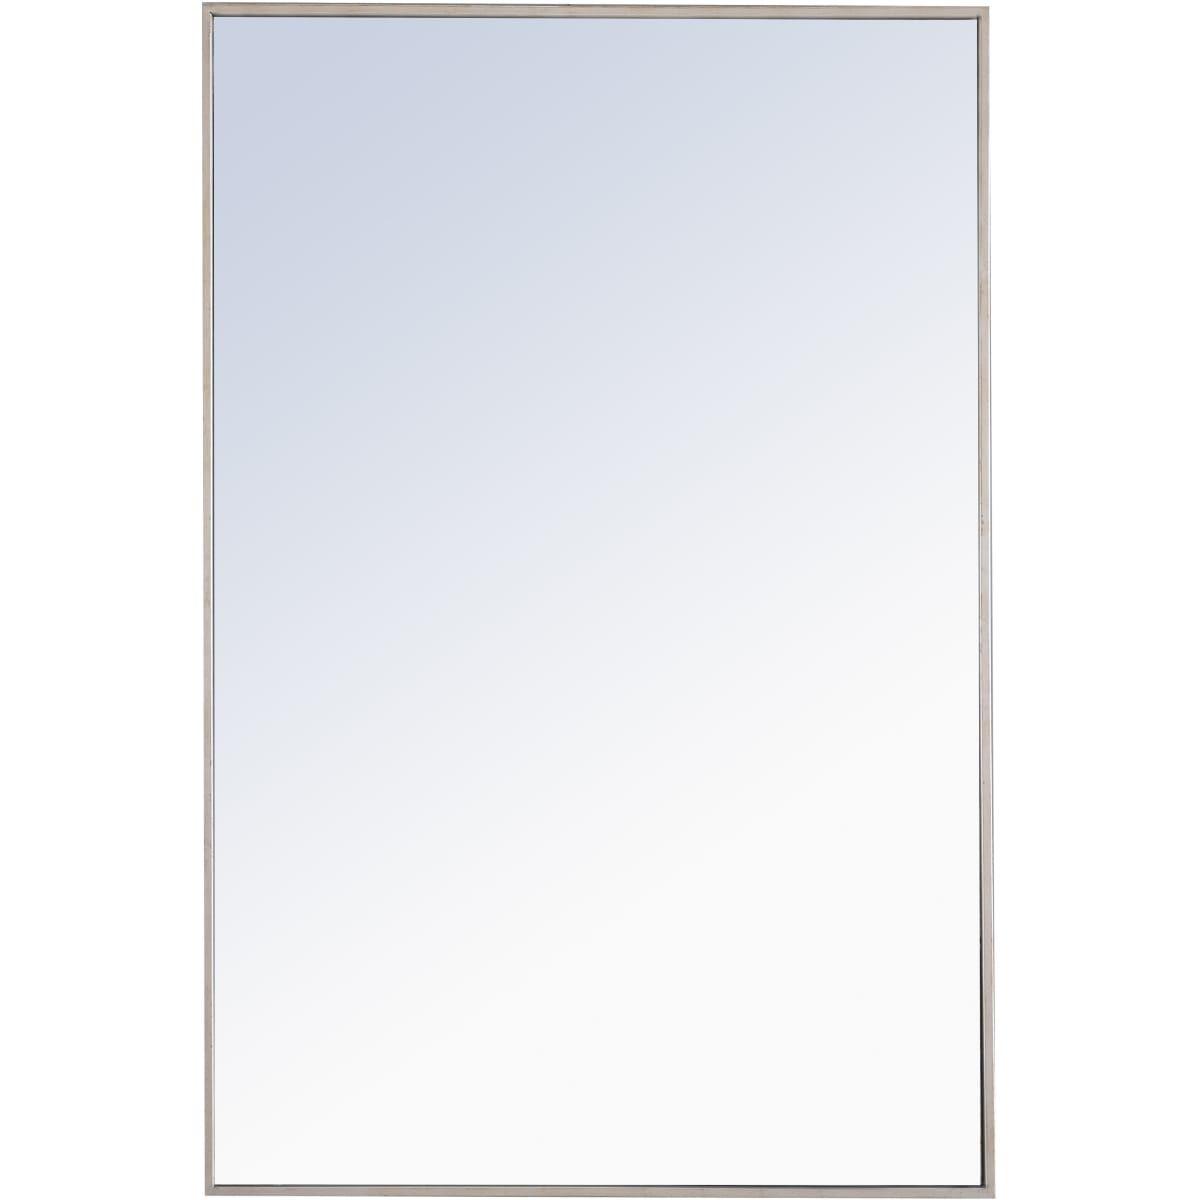 Elegant Lighting Mr407x 28 Home Decor Mirrors Lighting Mirror